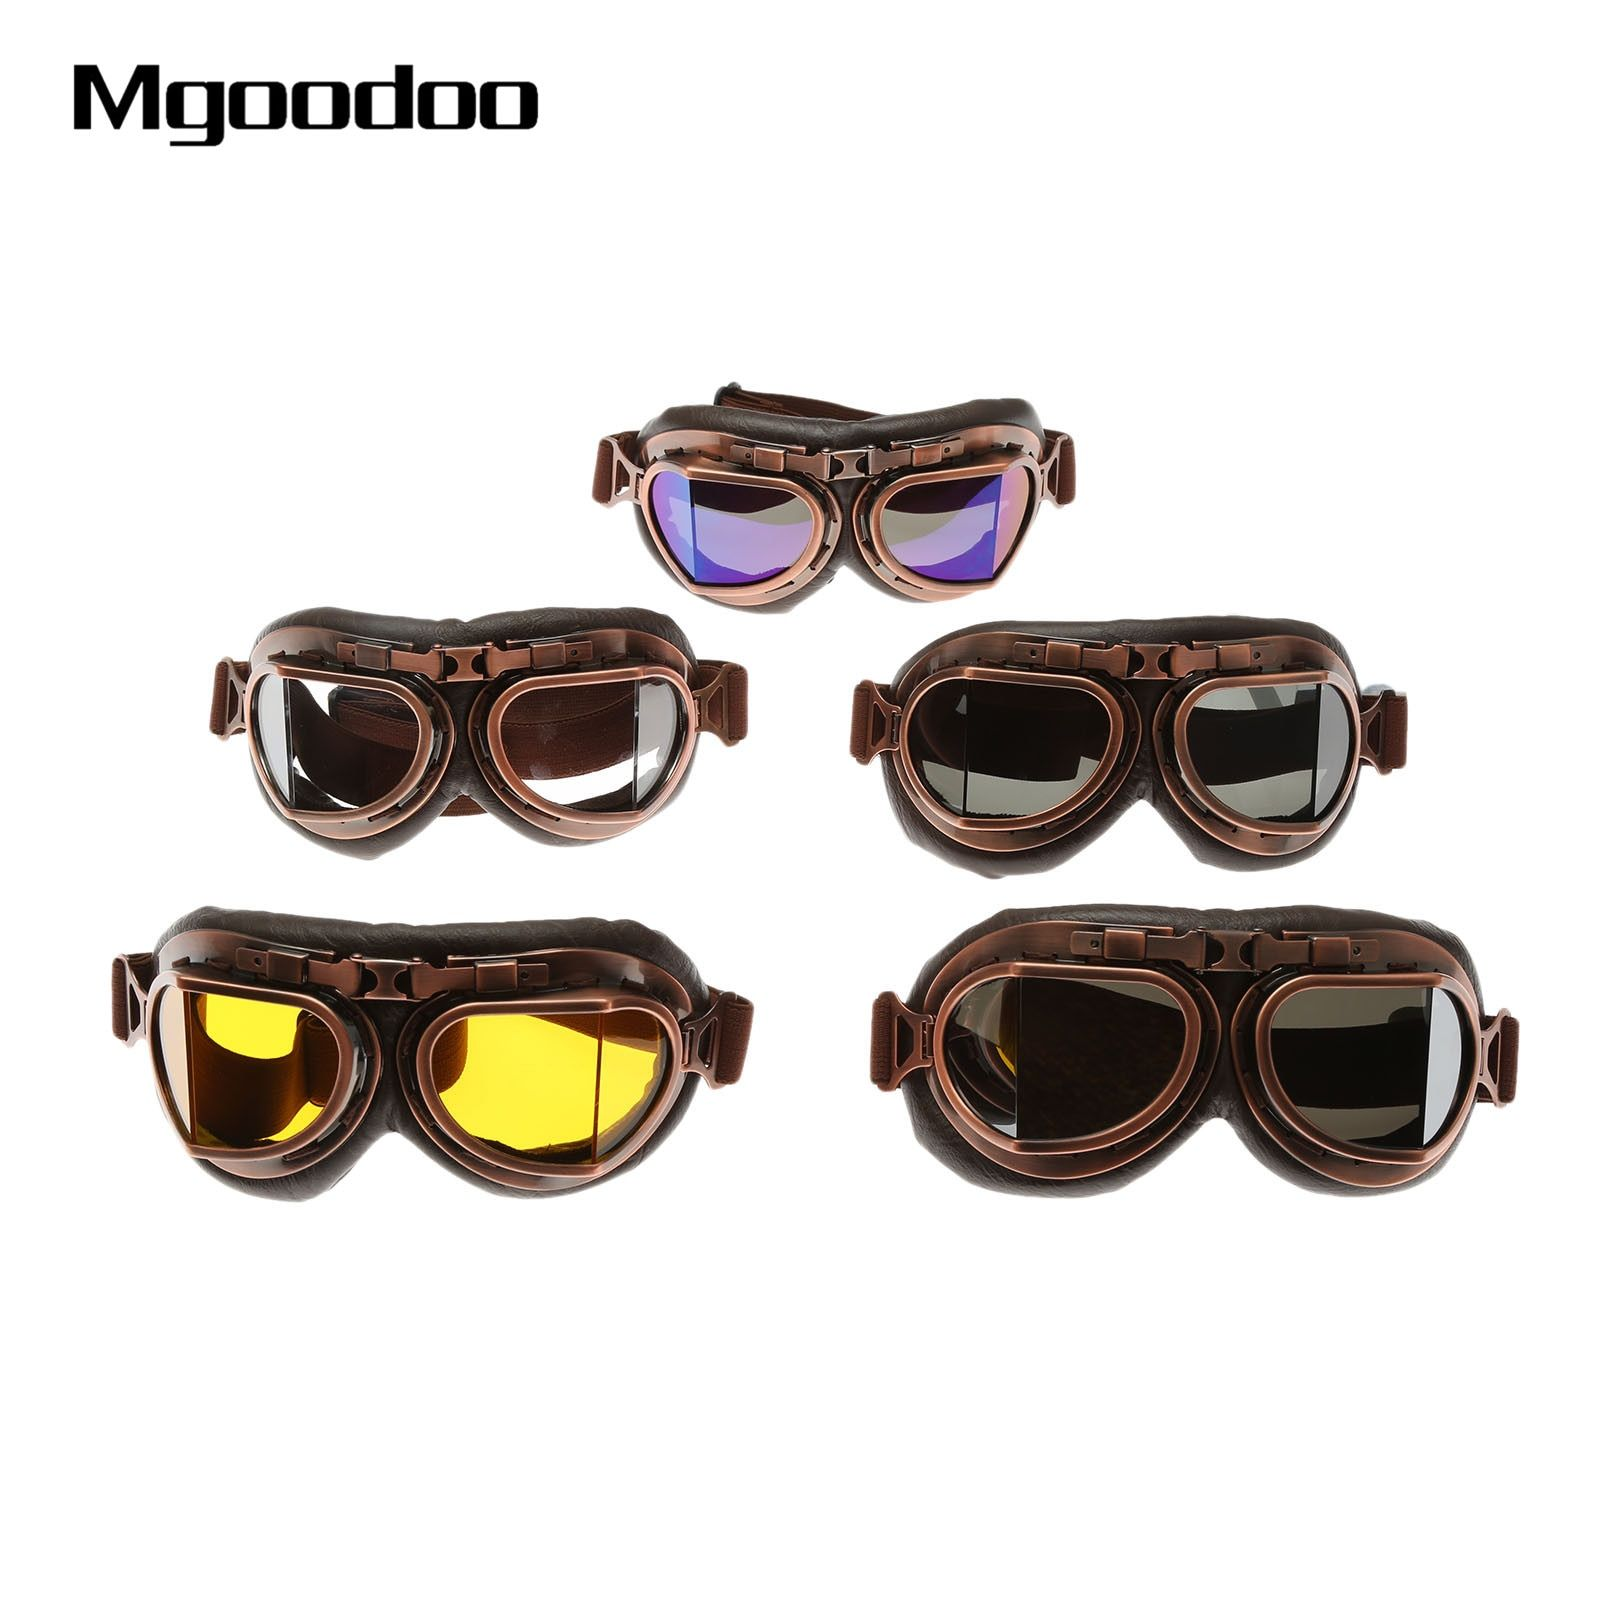 d8241607db Best Seller Motorcycle Goggles Glasses Vintage Motocross Eyewear Goggles  Retro Aviator Pilot Steampunk ATV Bike UV Protection Gear Glasses